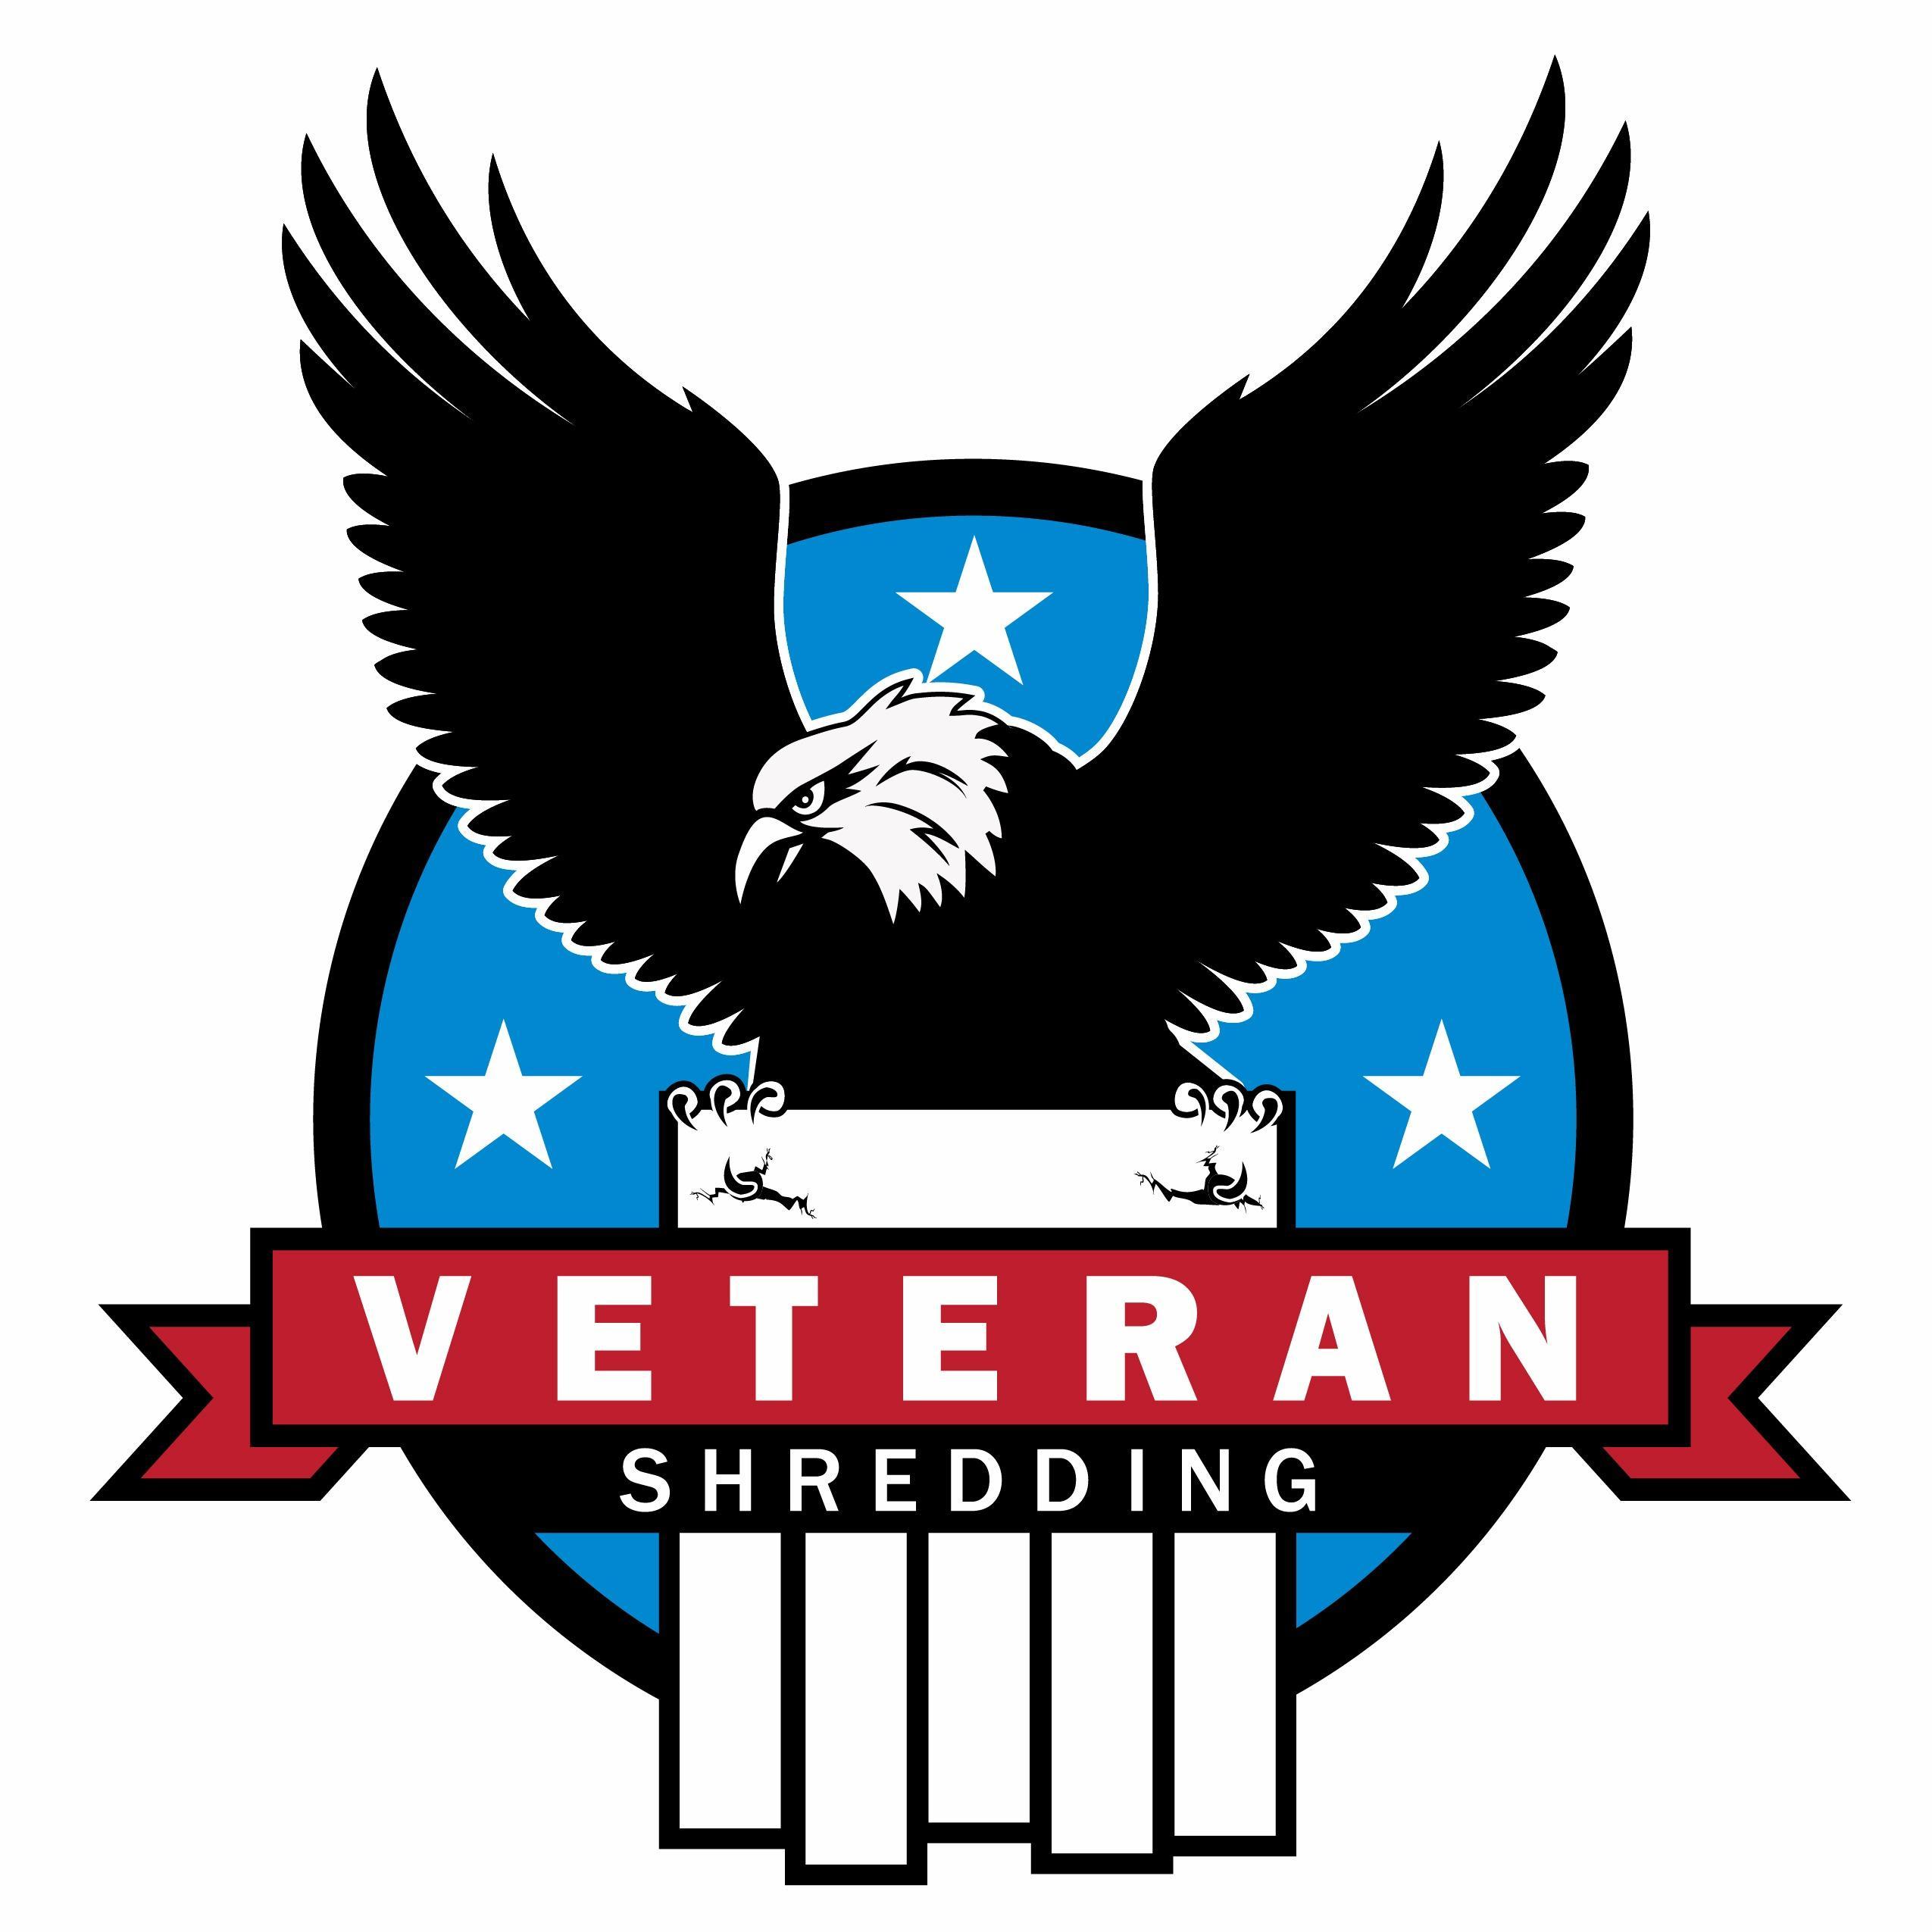 Veteran Shredding